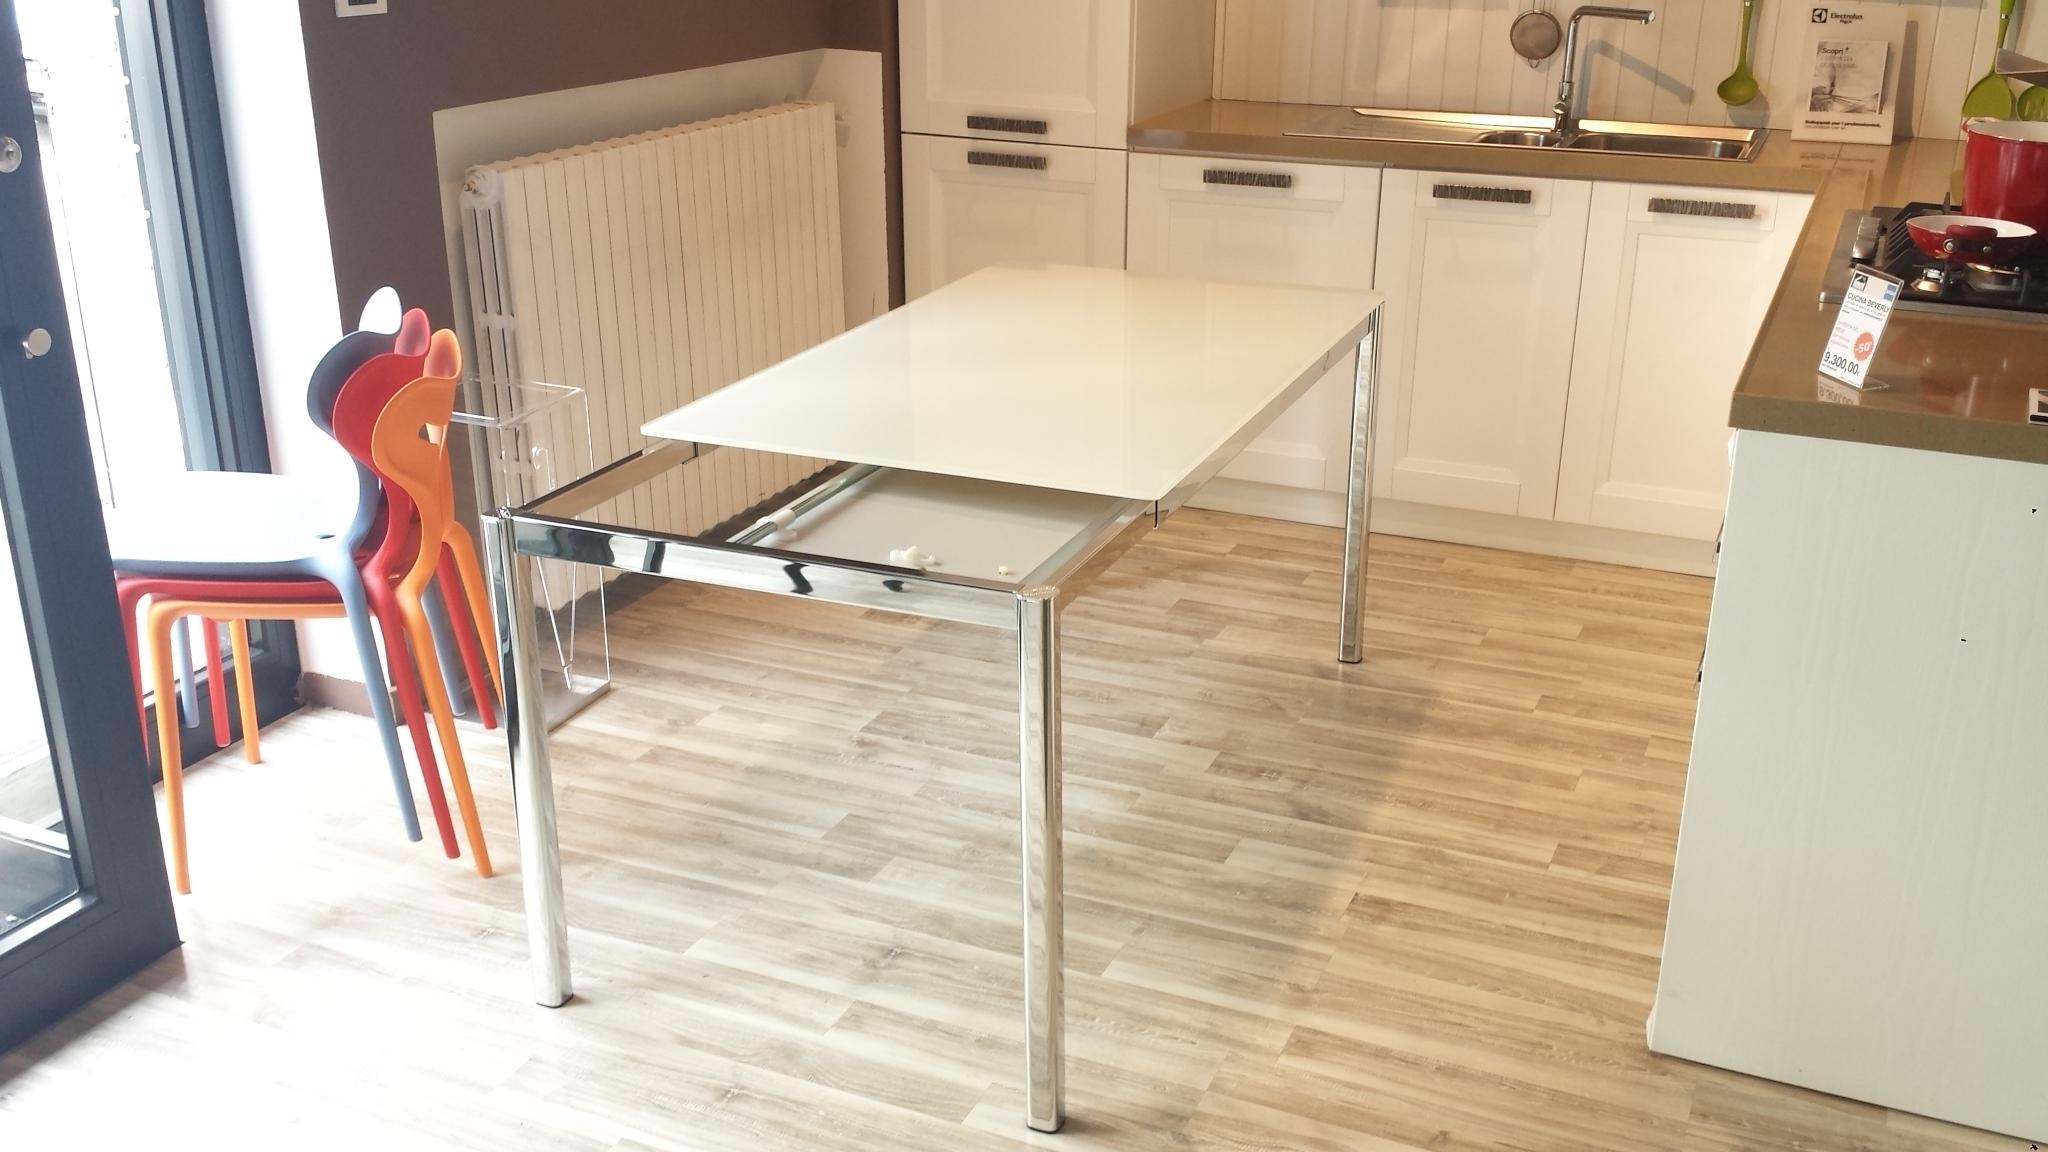 Tavolo da cucina allungabile performance tavoli a prezzi - Tavolo cucina allungabile ikea ...